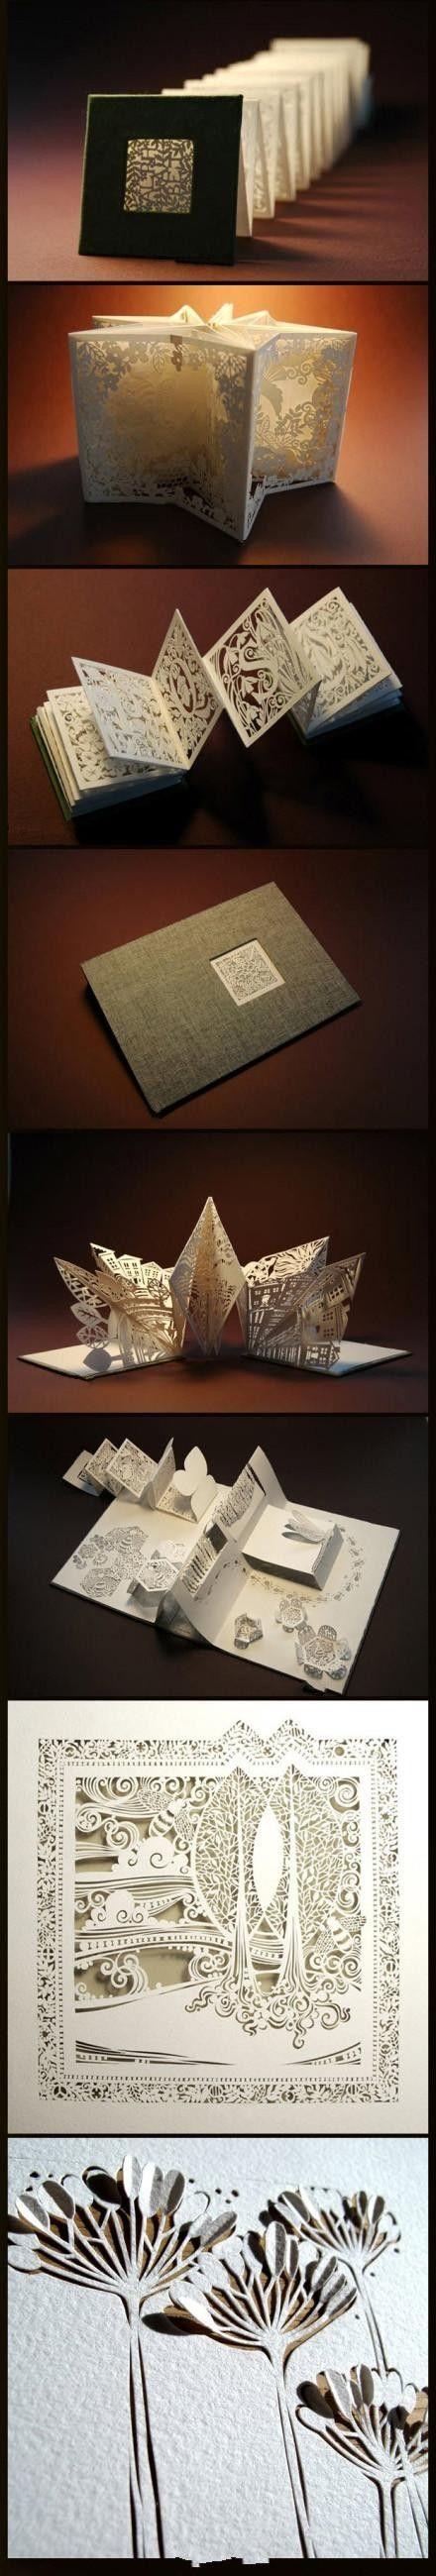 8 delicate paper carvings